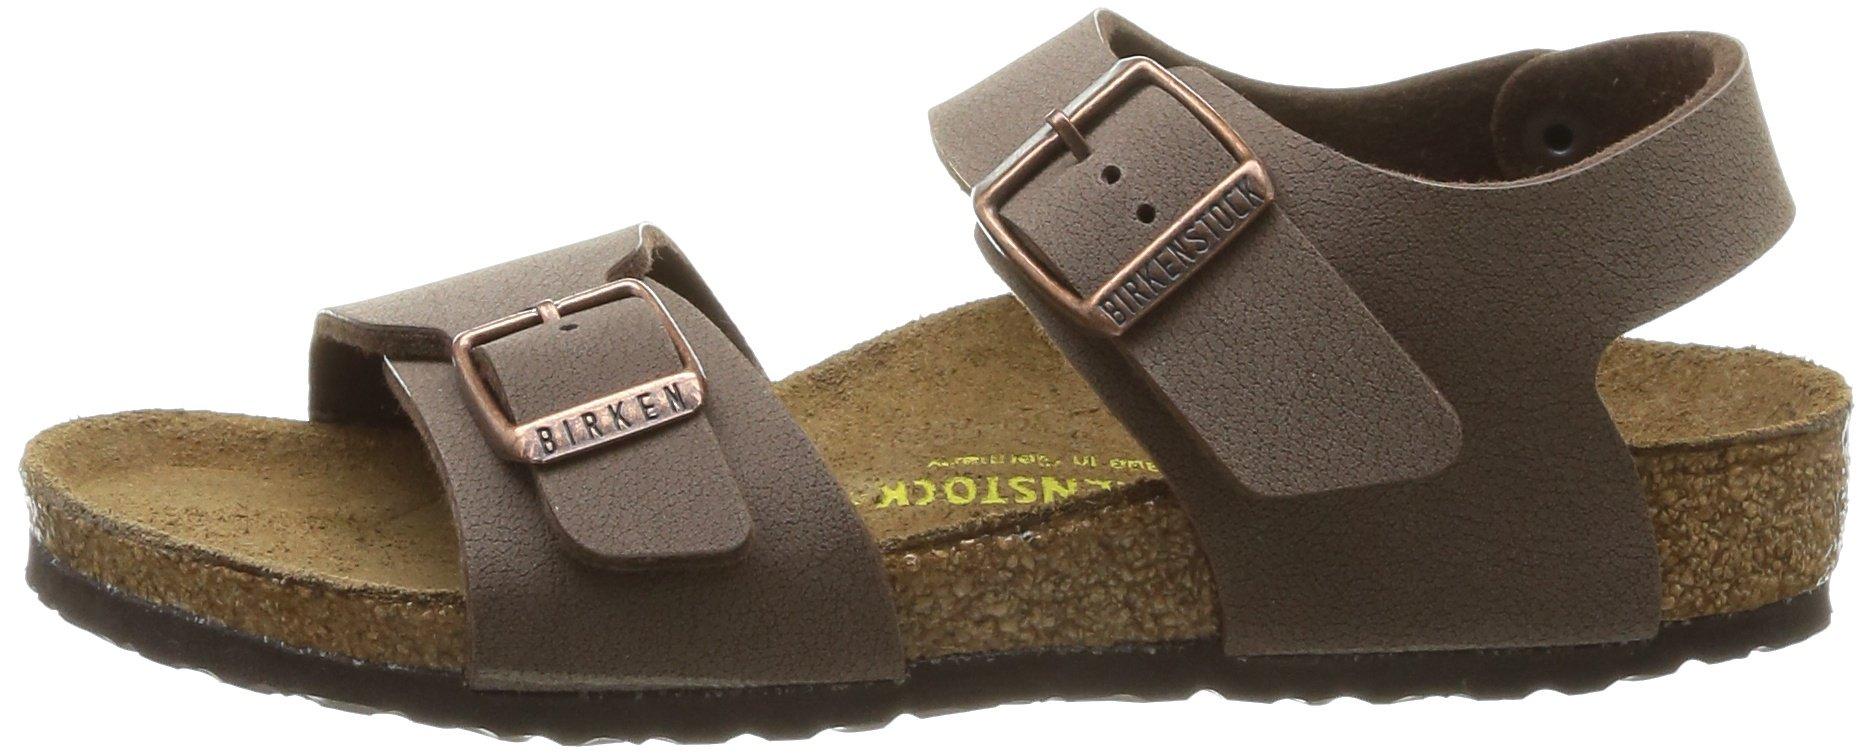 Birkenstock Unisex-Child New York Kids Mocca Birkibuc Sandals 24.0 N EU N 087783 by Birkenstock (Image #5)